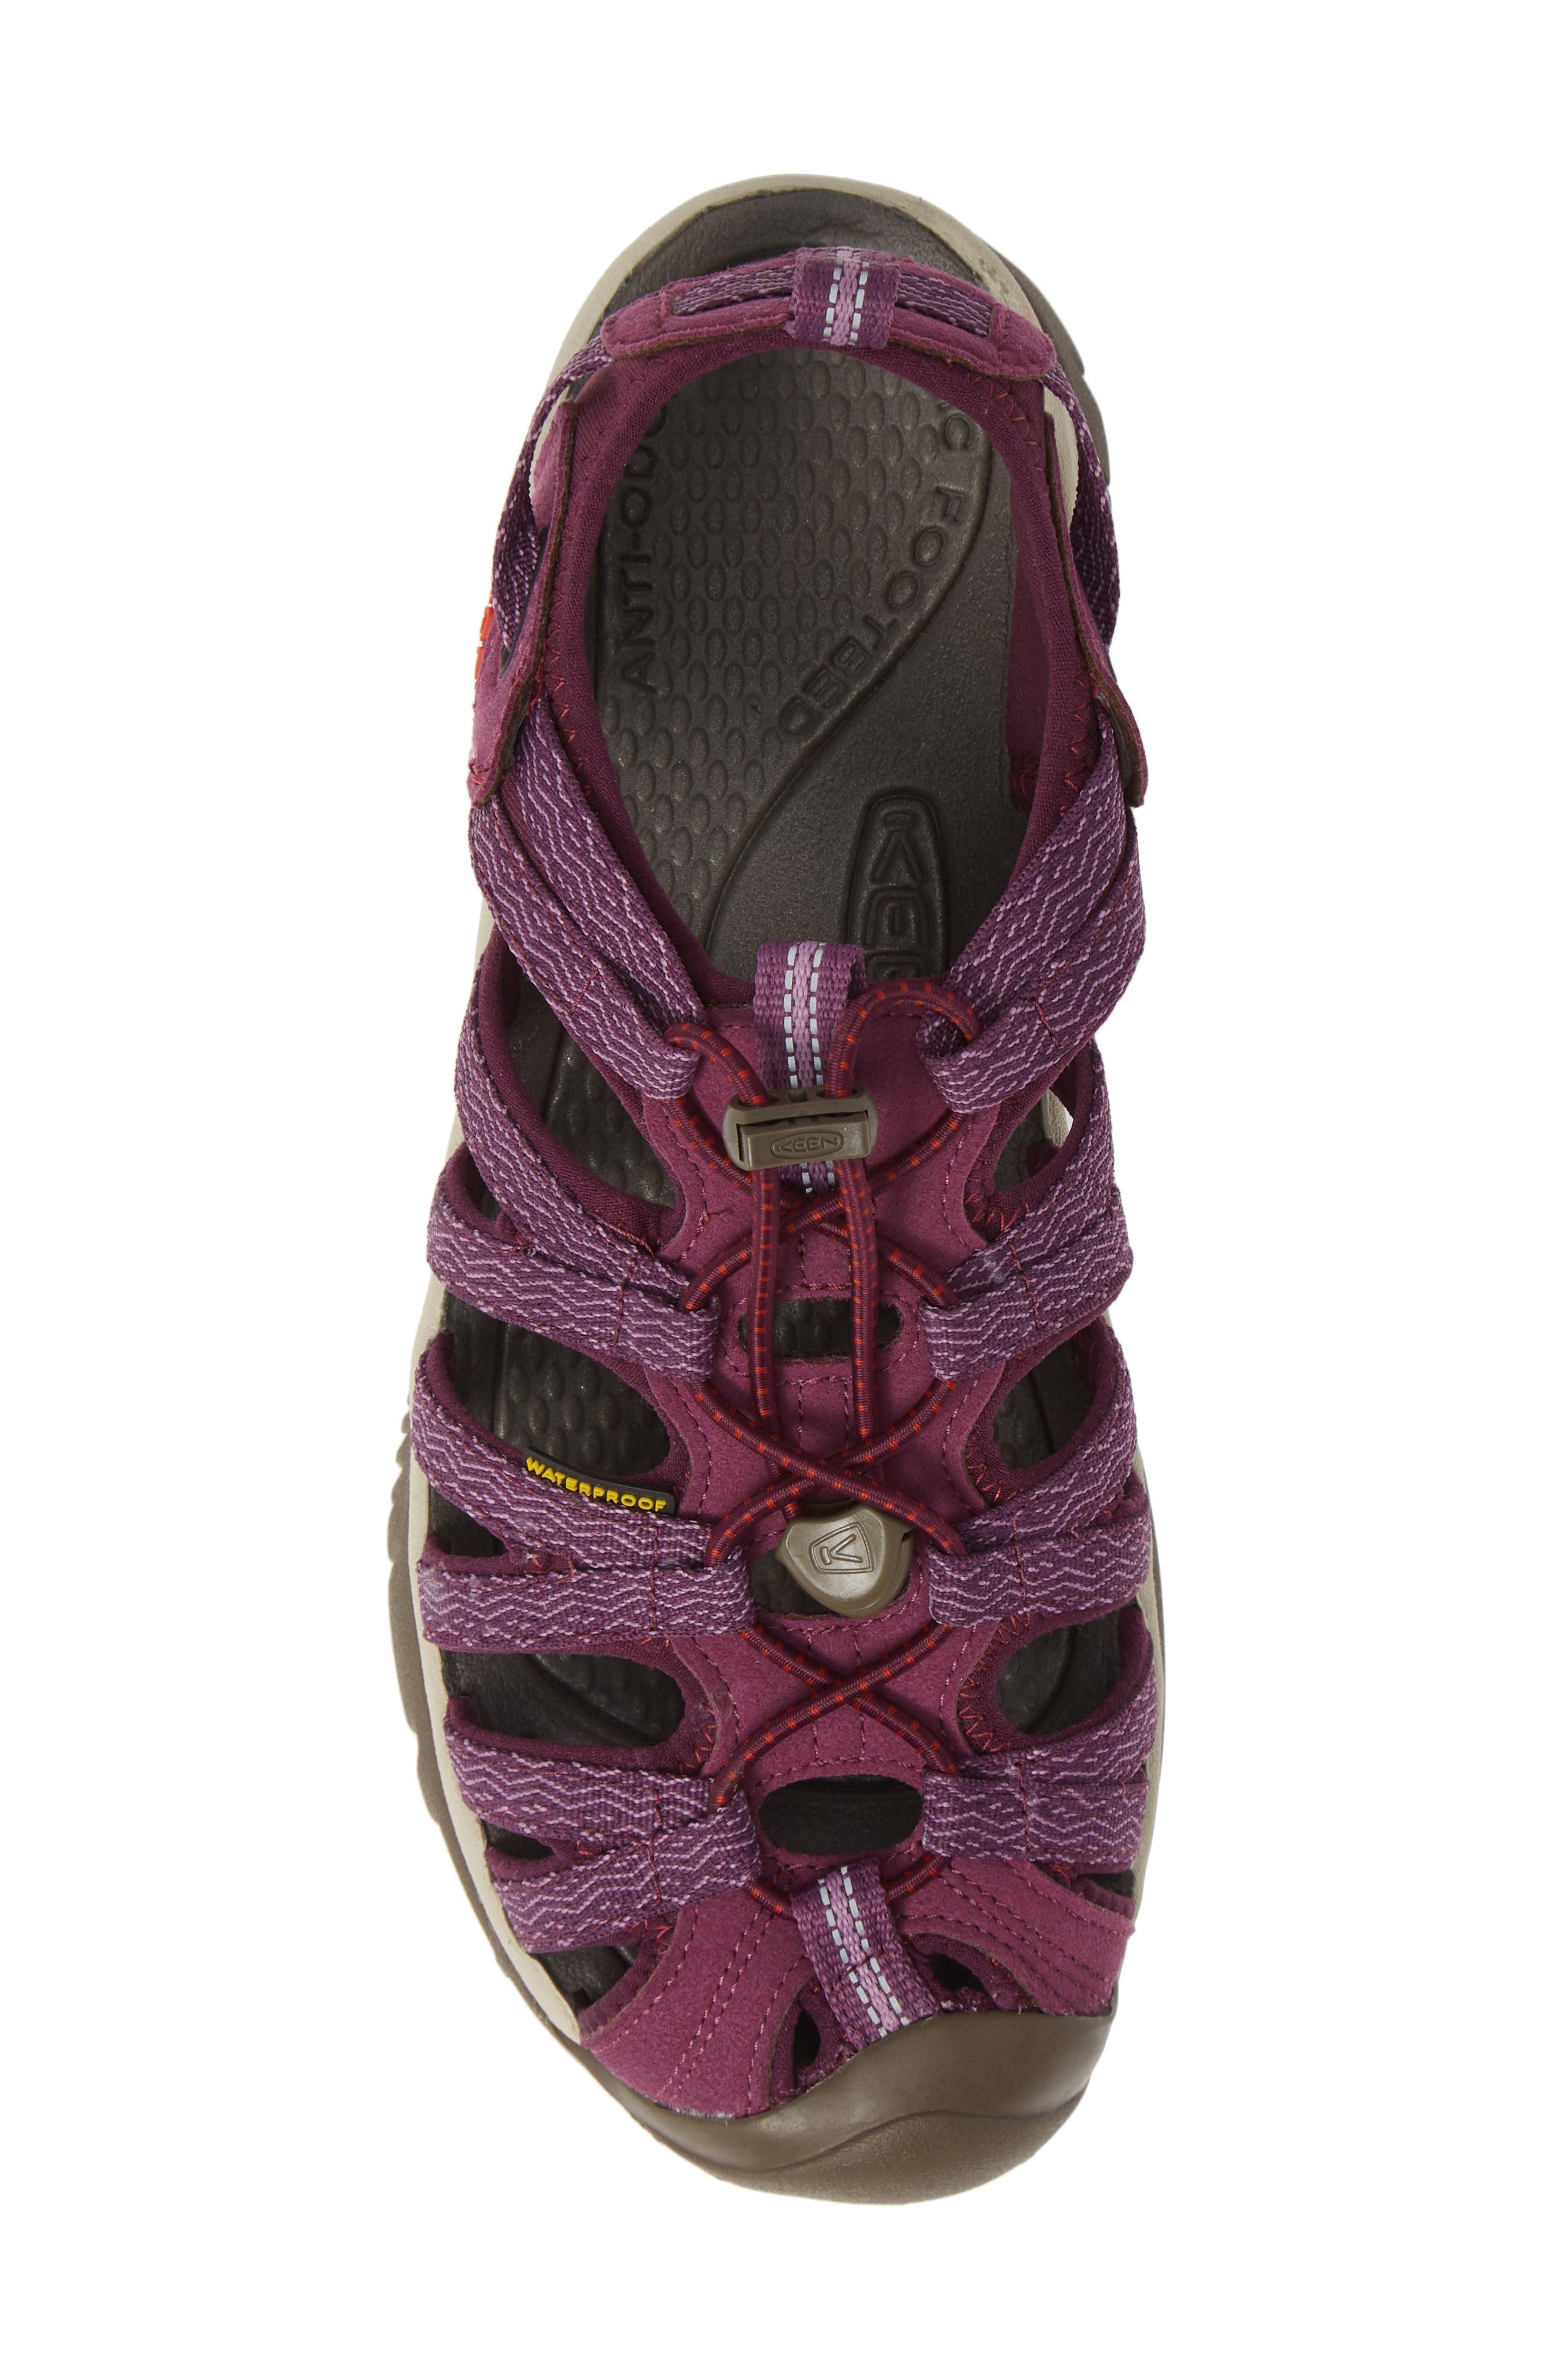 'Whisper' Water Friendly Sport Sandal,                             Alternate thumbnail 5, color,                             Grape Kiss/ Grape Wine